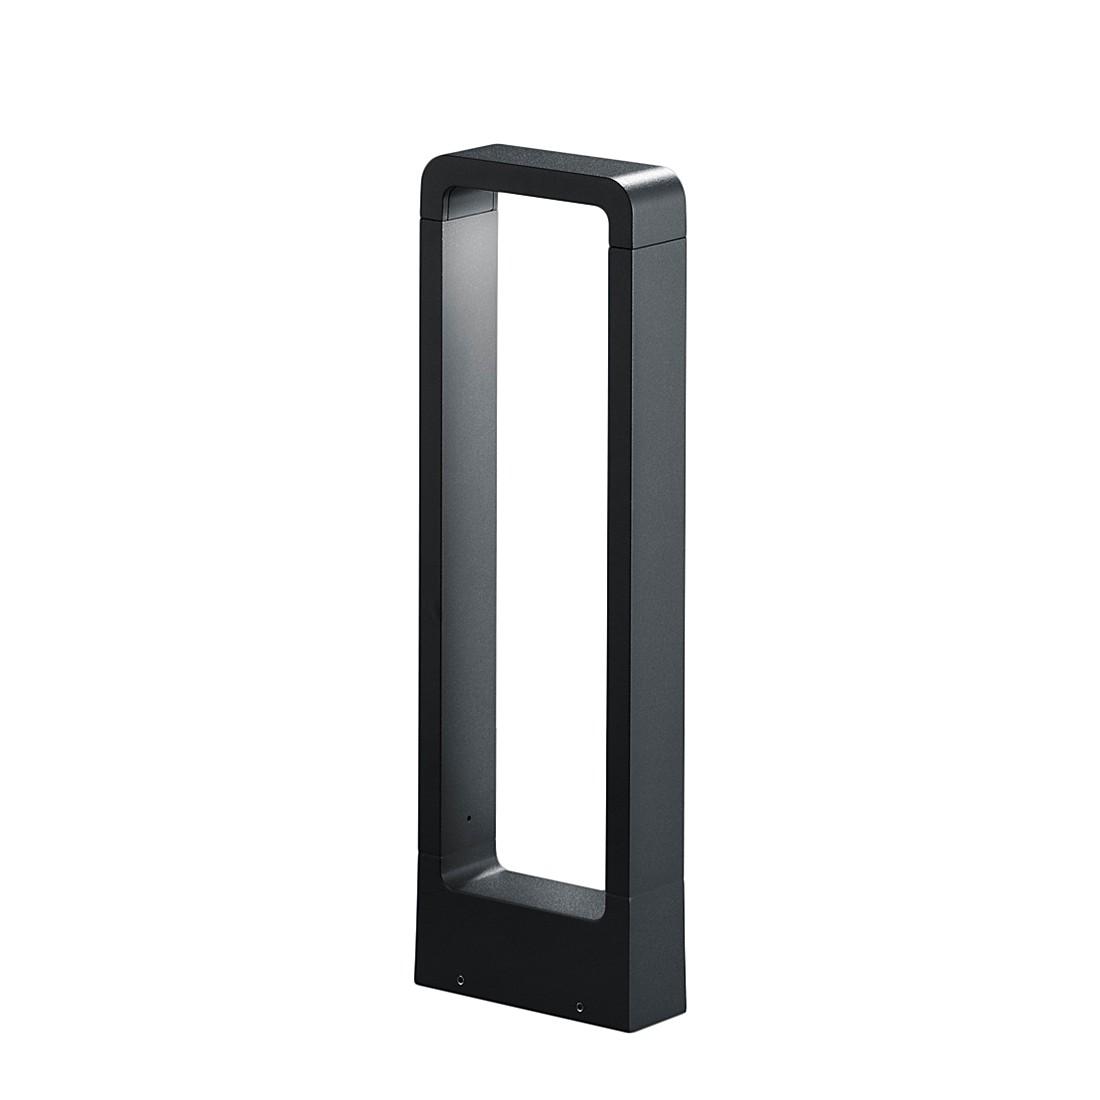 EEK A+, LED-Außenleuchte Reno - Aluminium / Kunststoff - 1-flammig, Trio